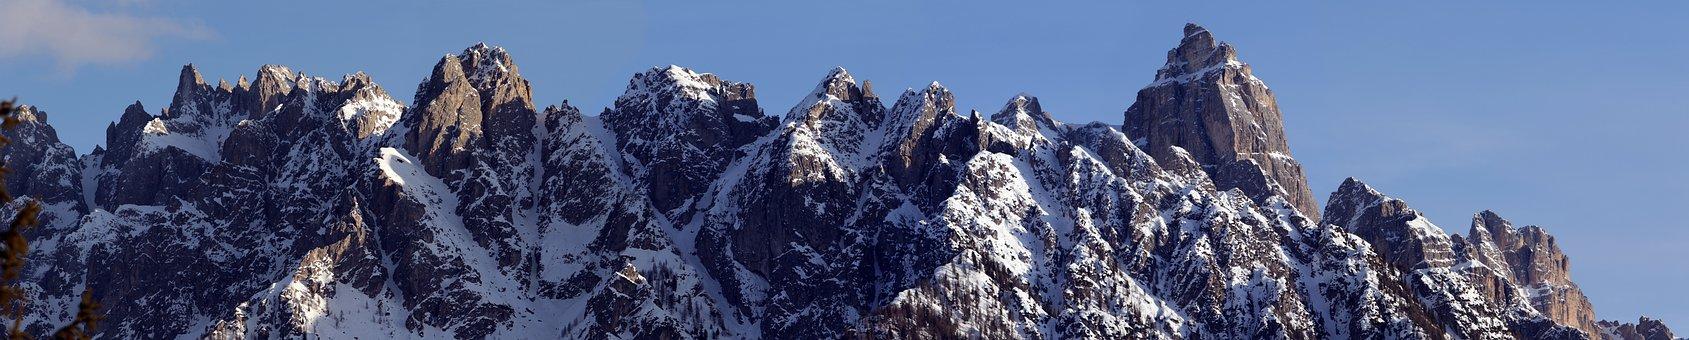 Haunold Massif, South Tyrol, San Candido Innichen